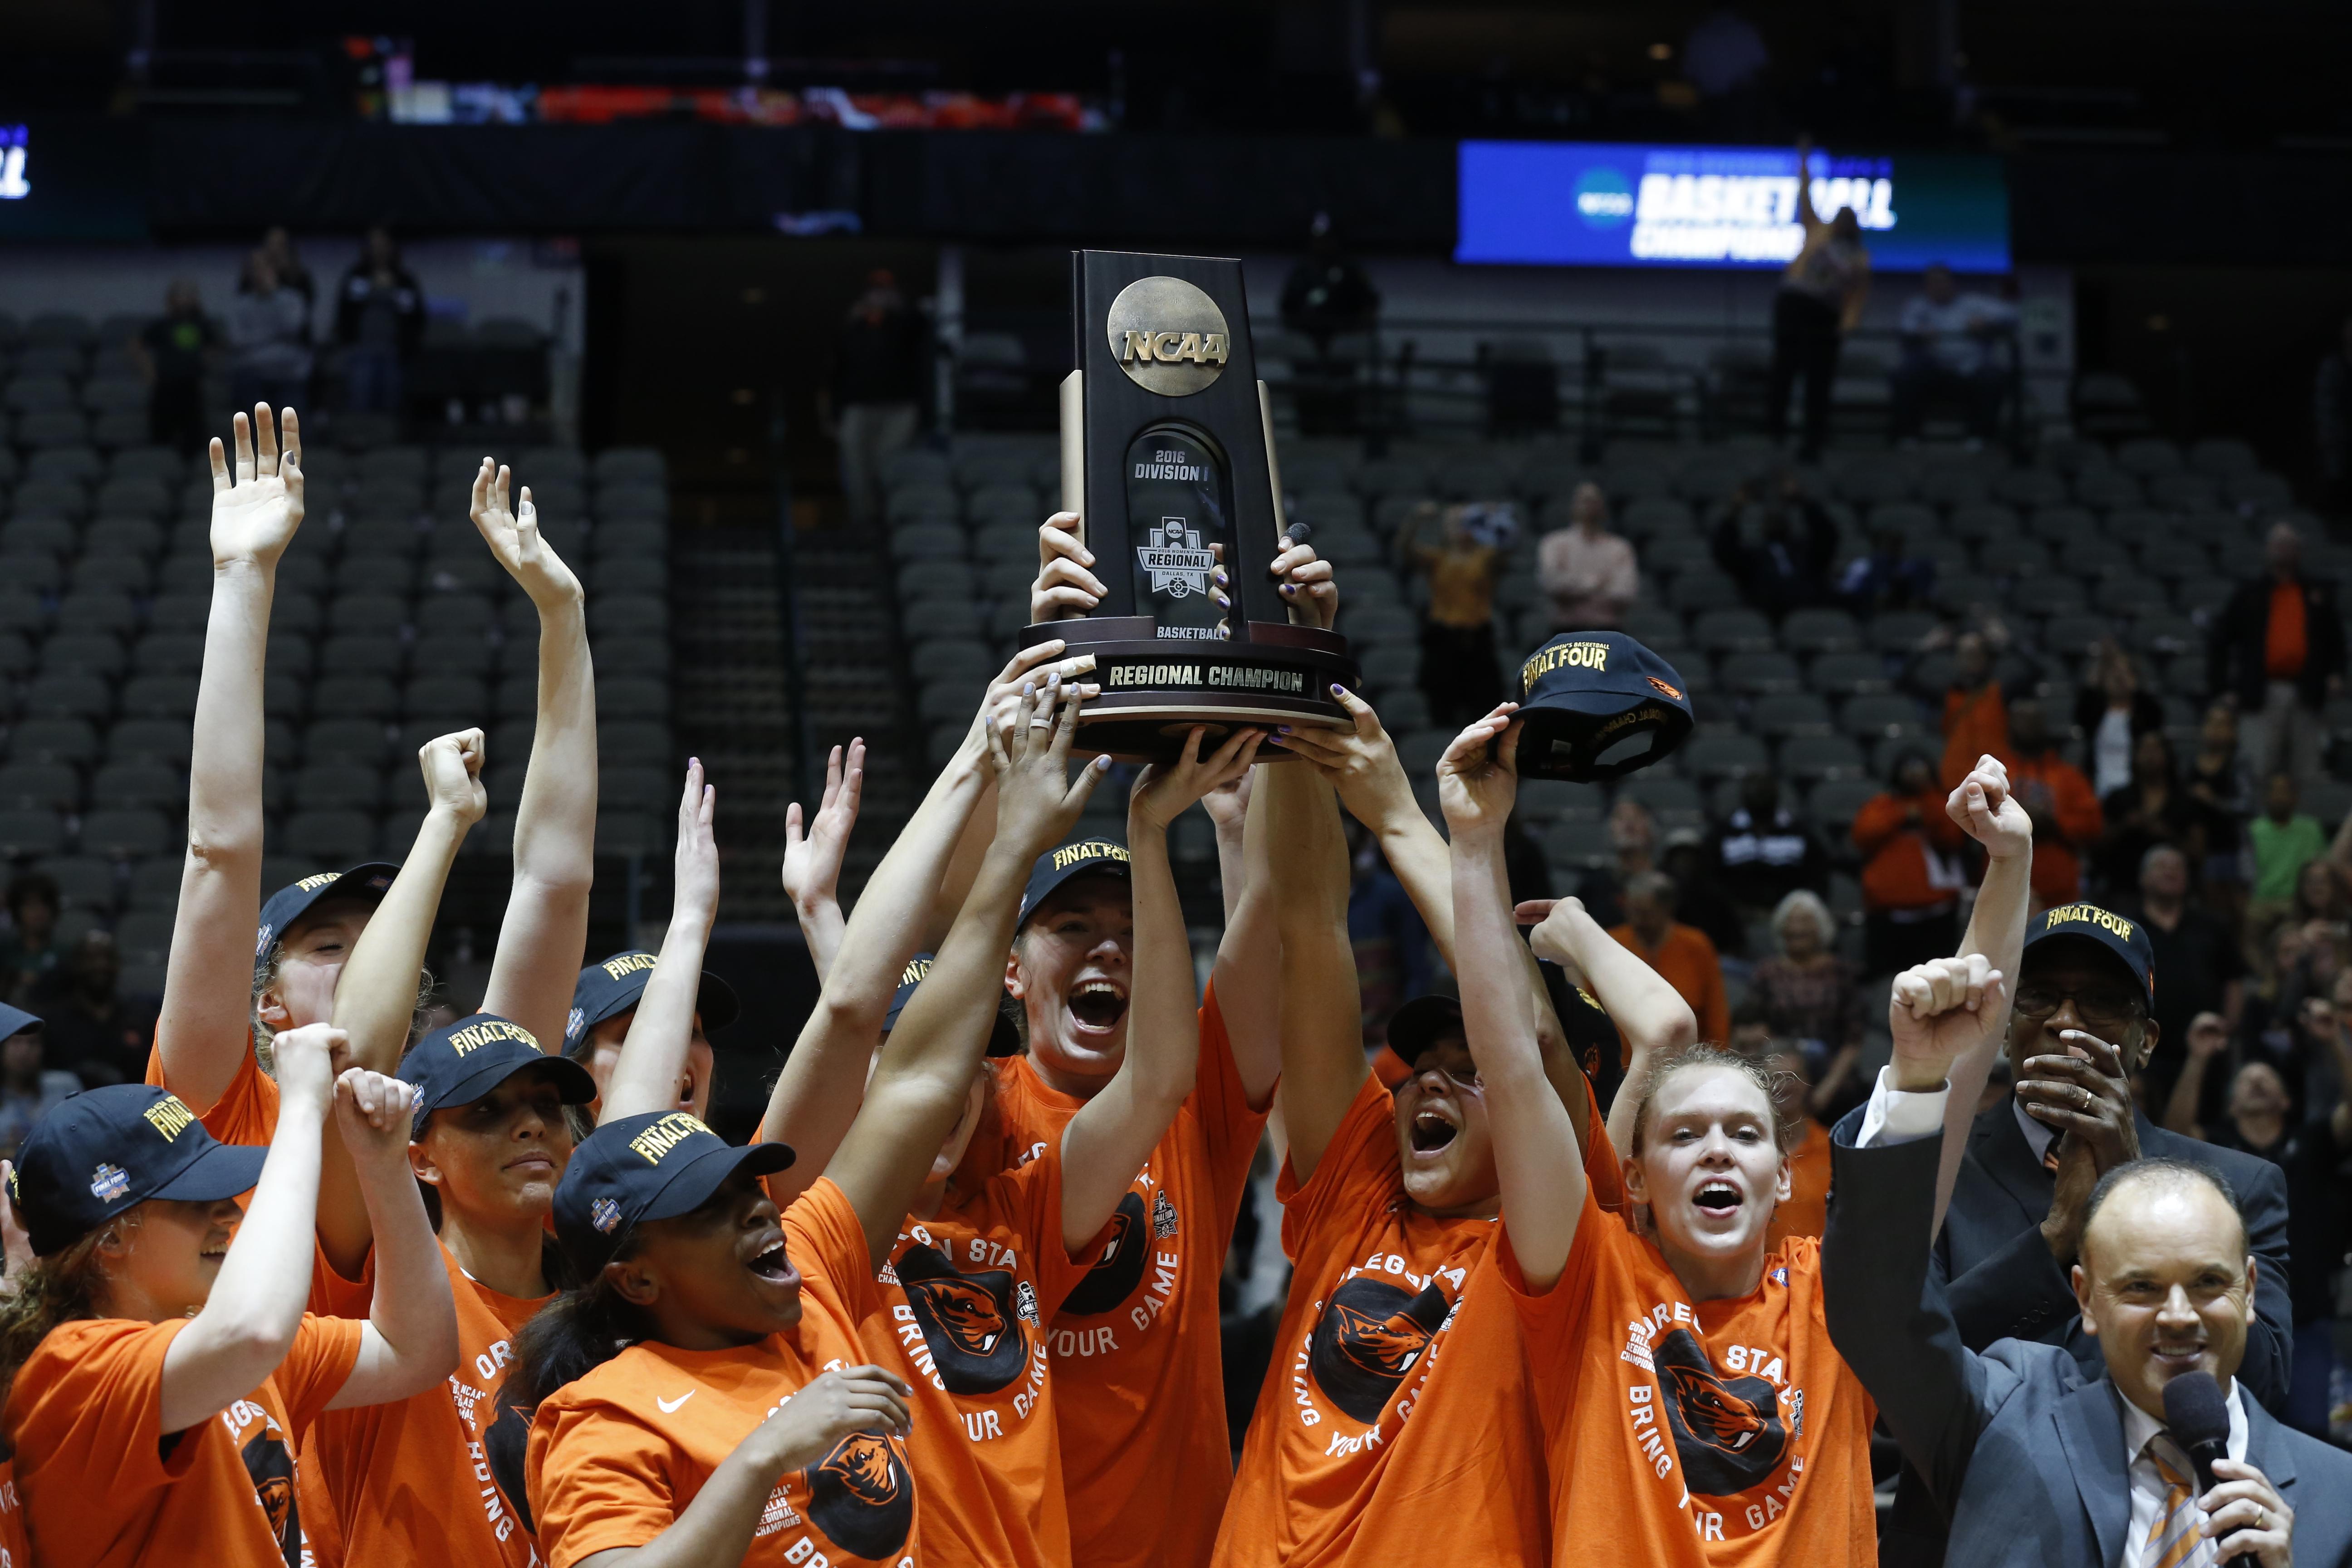 Video for NCAA Women's Basketball Regional